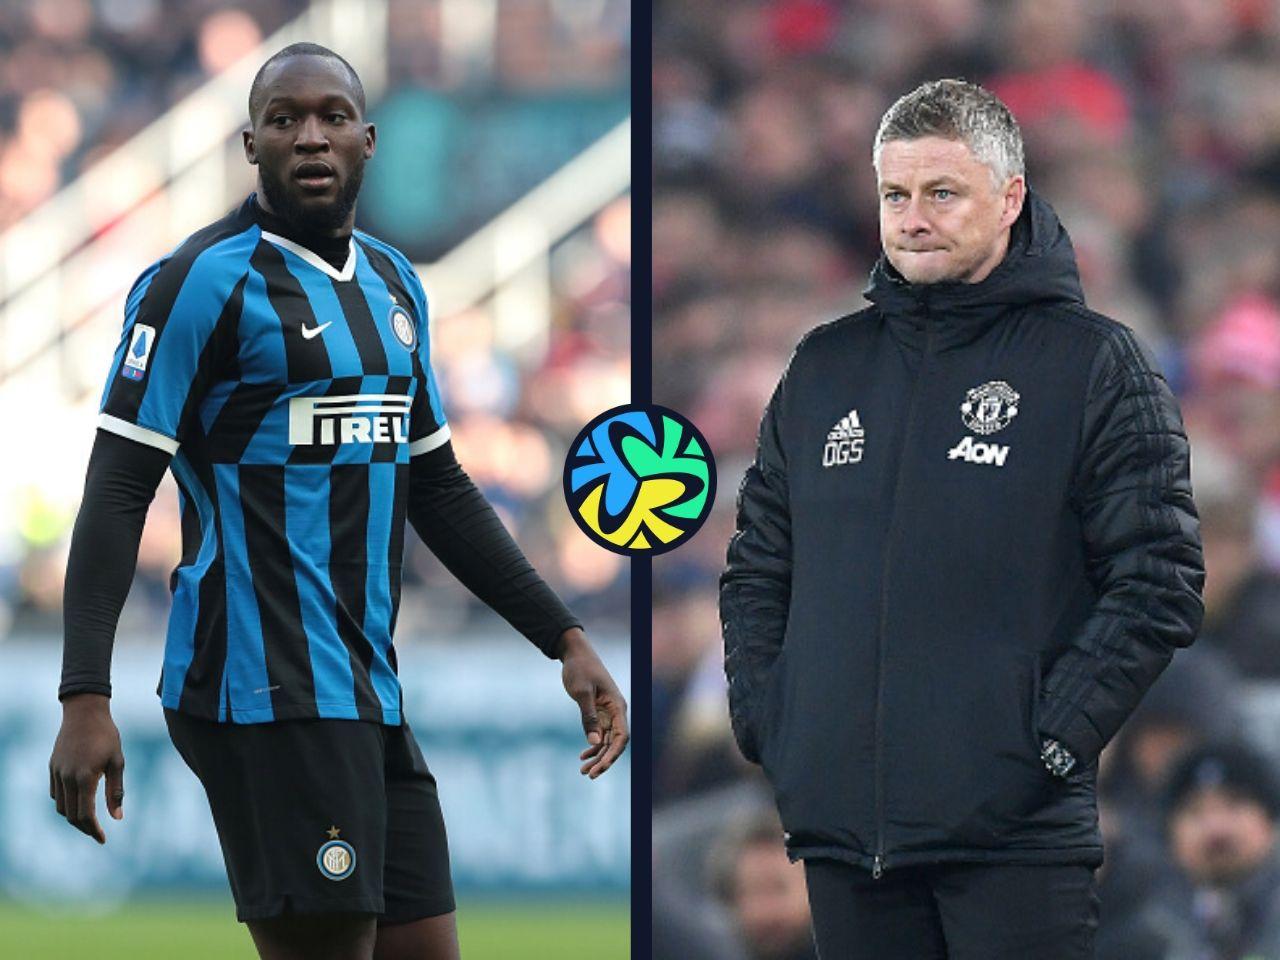 Romelu Lukaku, Ole Gunnar Solskjaer, Inter Milan